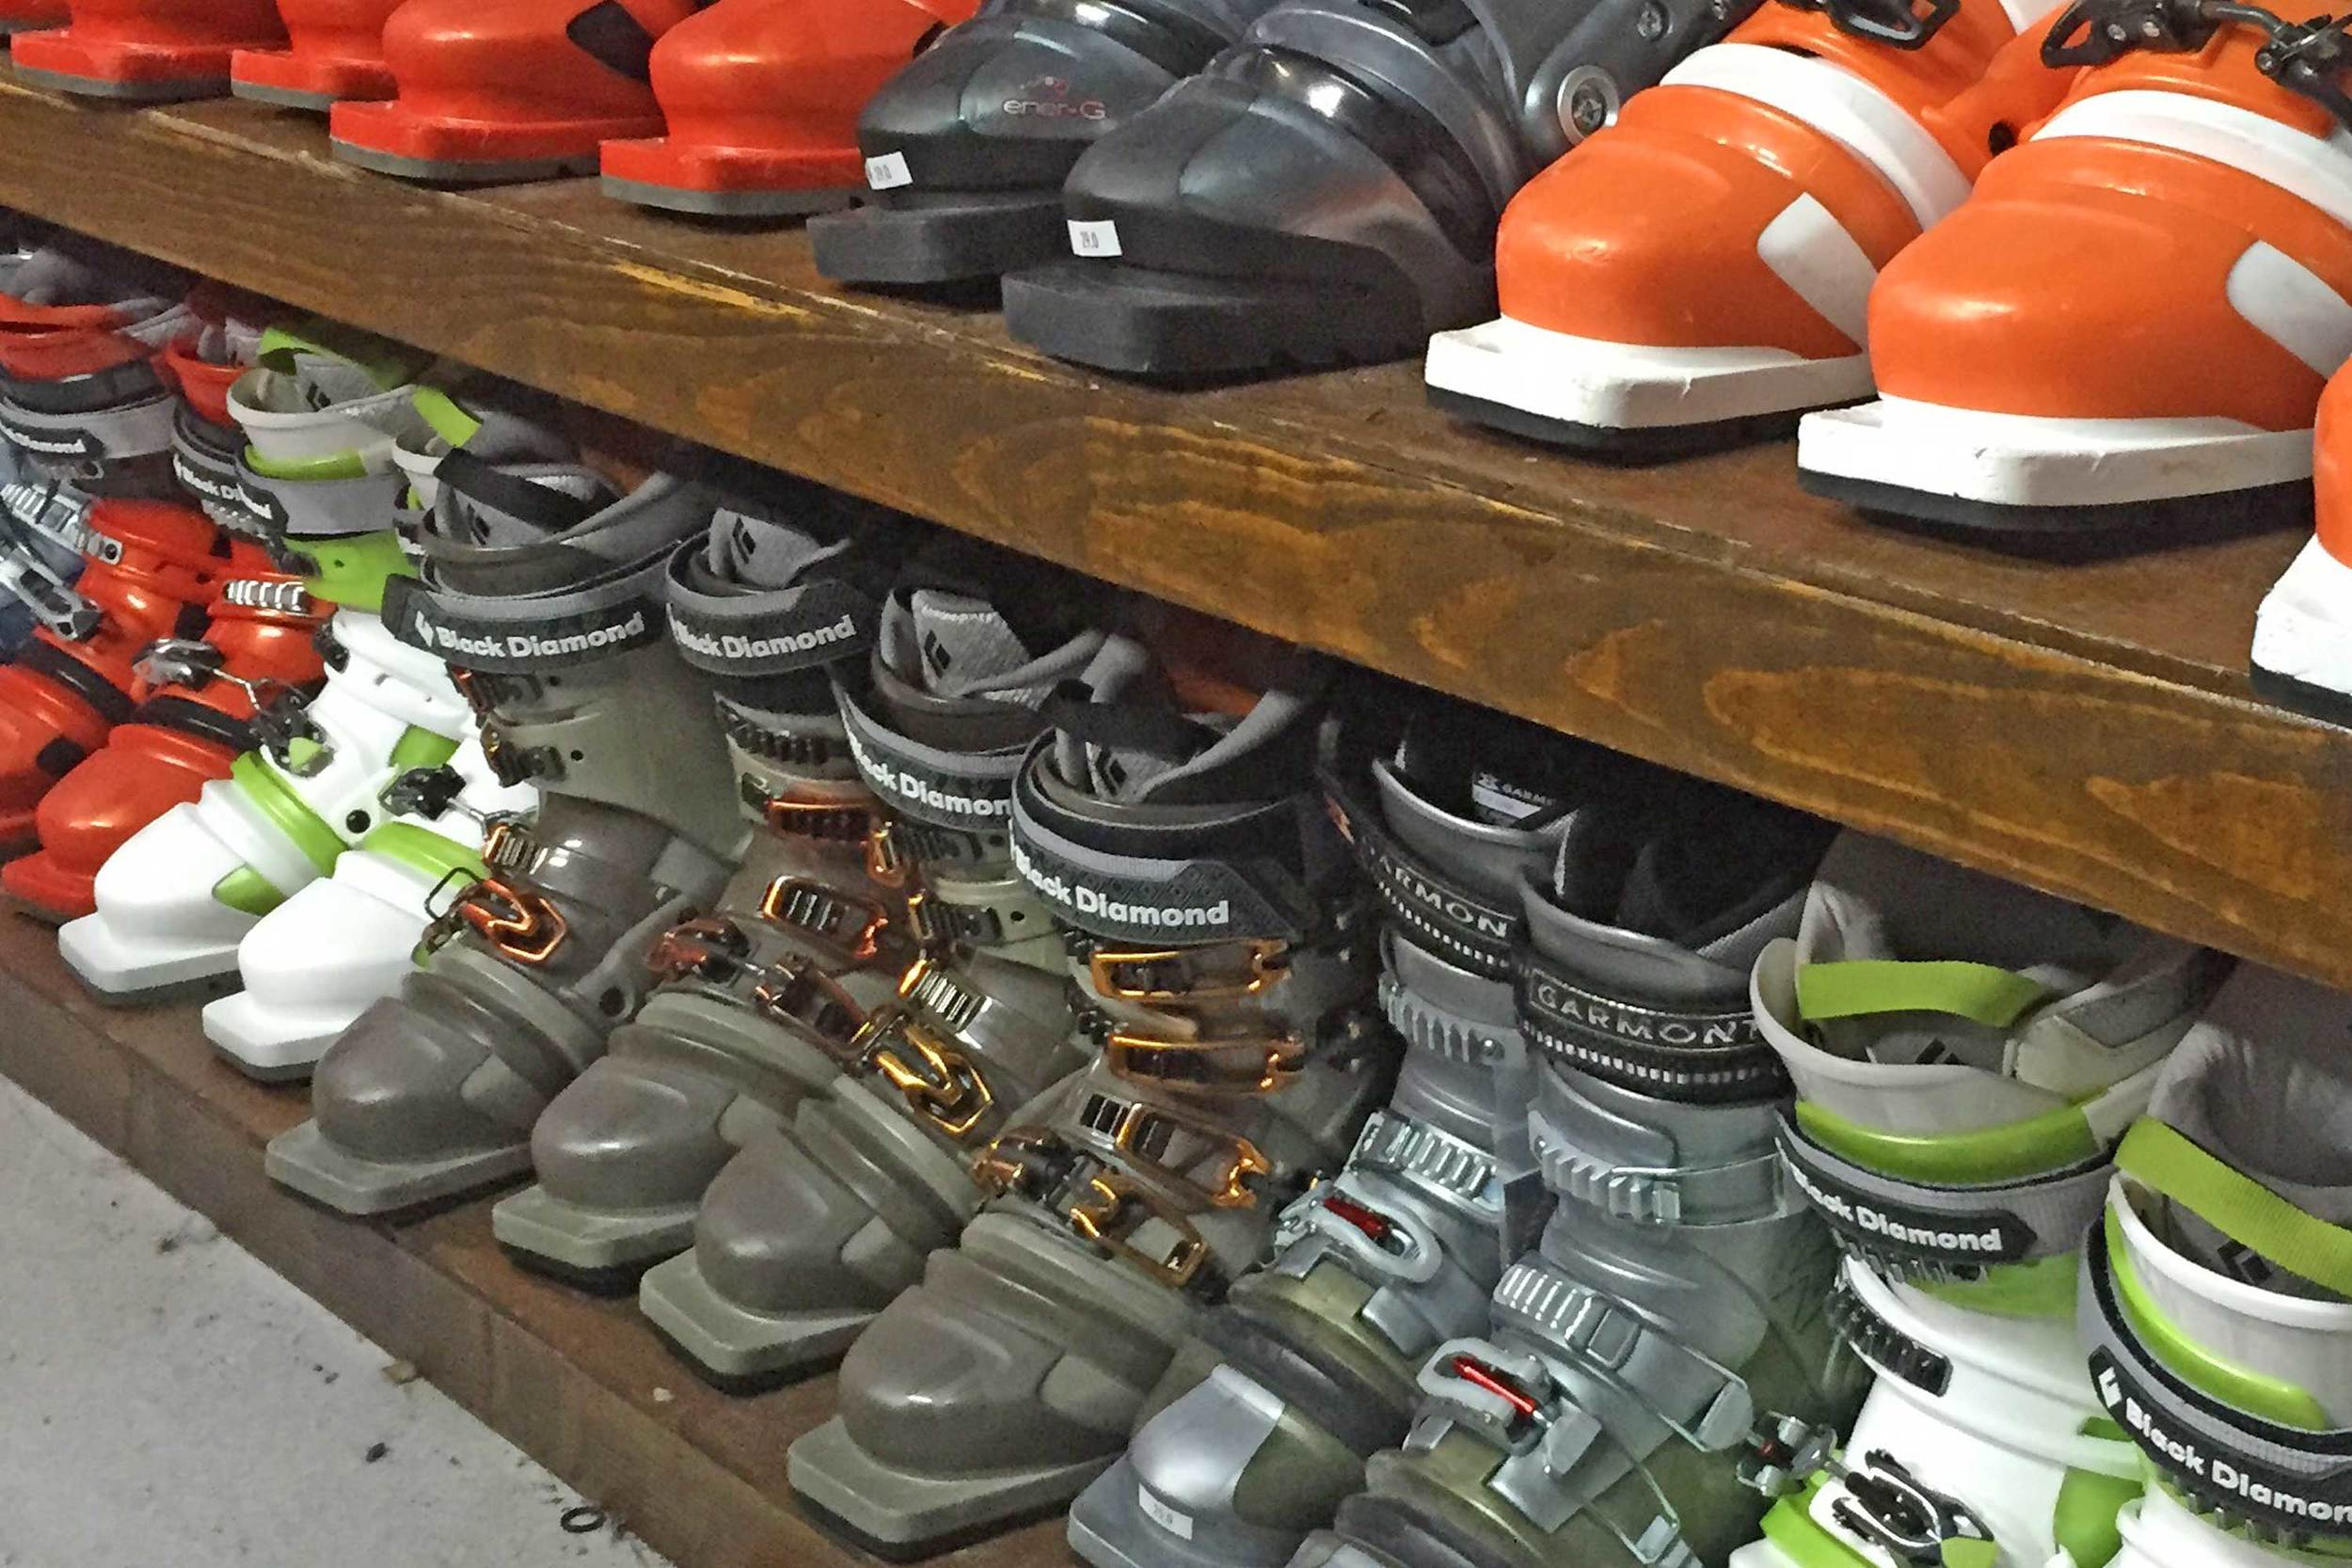 Telemark Boots to 30.5 Mondo